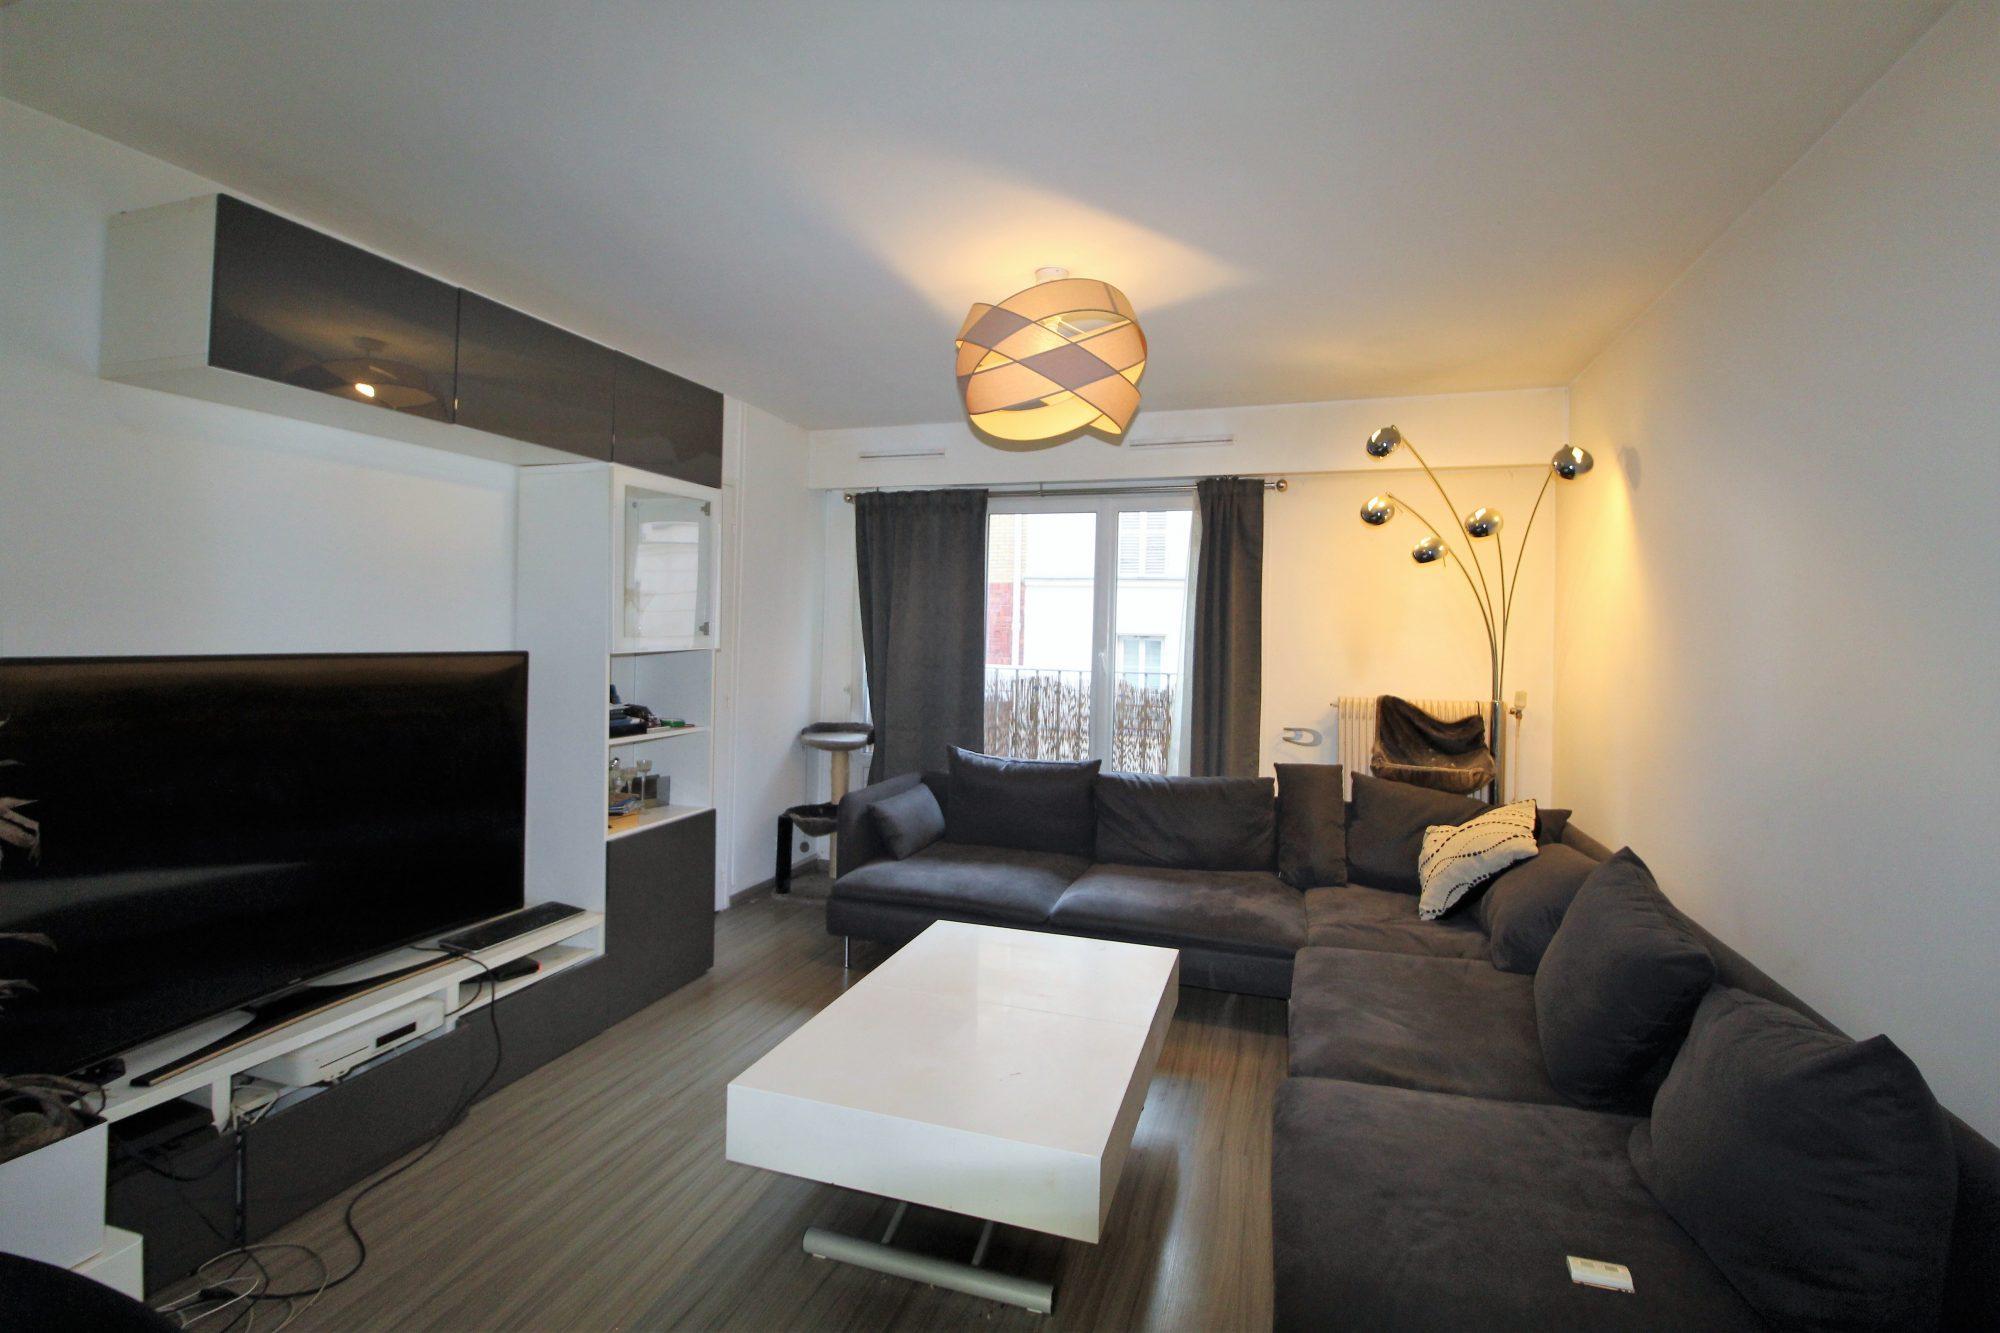 appartement vendre paris ref 704 appartement r nover. Black Bedroom Furniture Sets. Home Design Ideas